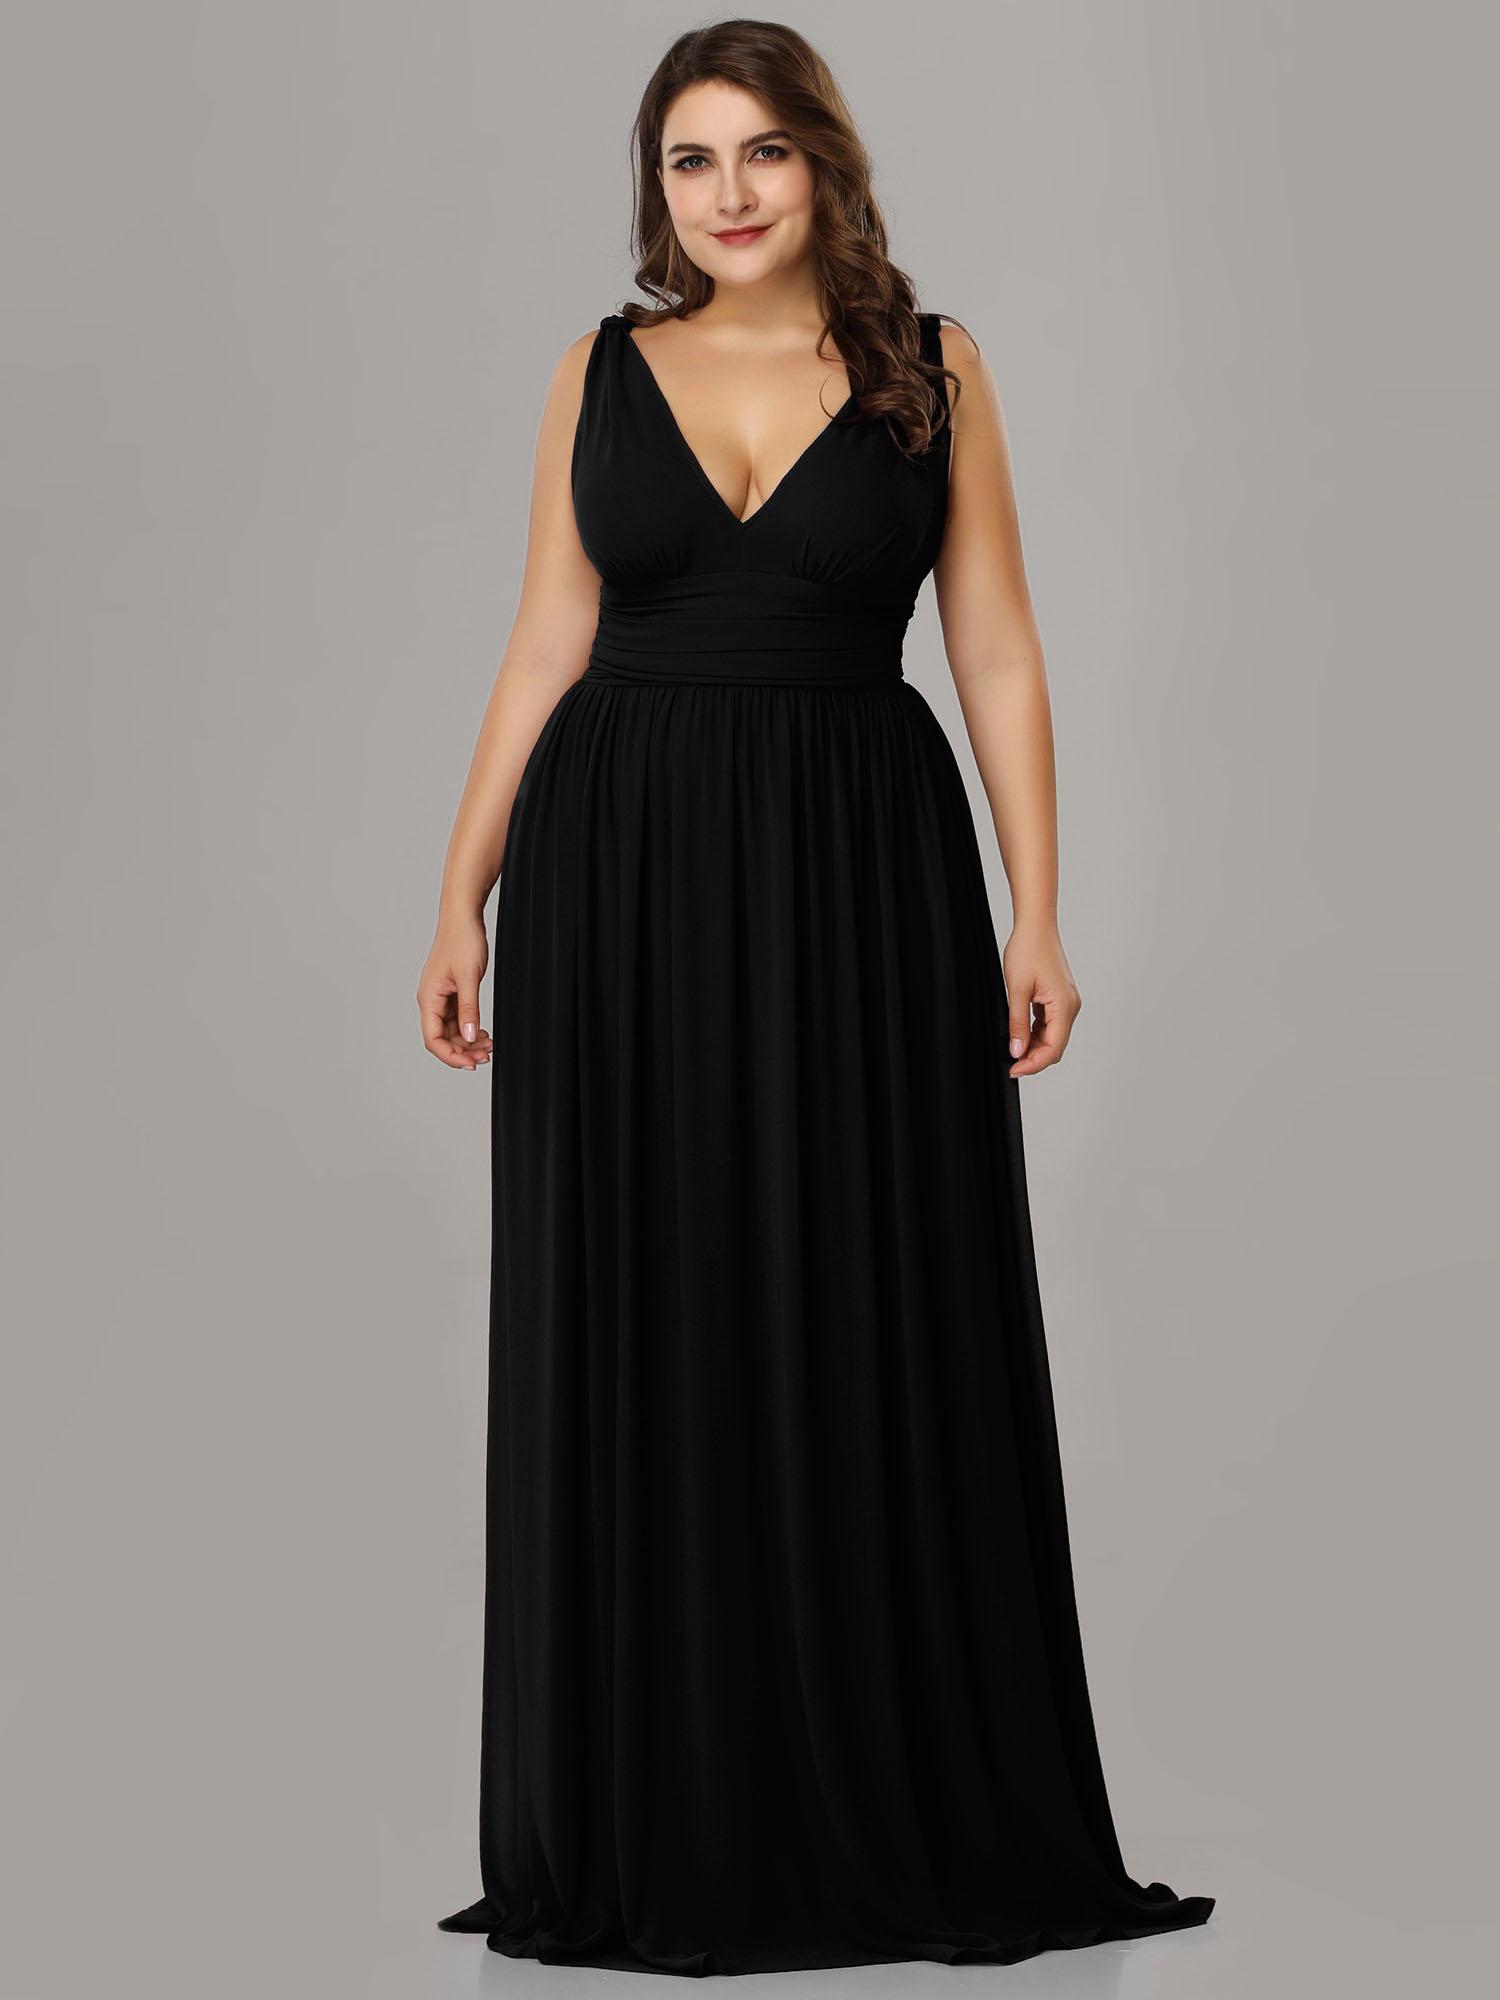 Abendkleid Curvy Ballkleider Große Größen V Ausschnitt Lang Weinrot Chiffon  Falten